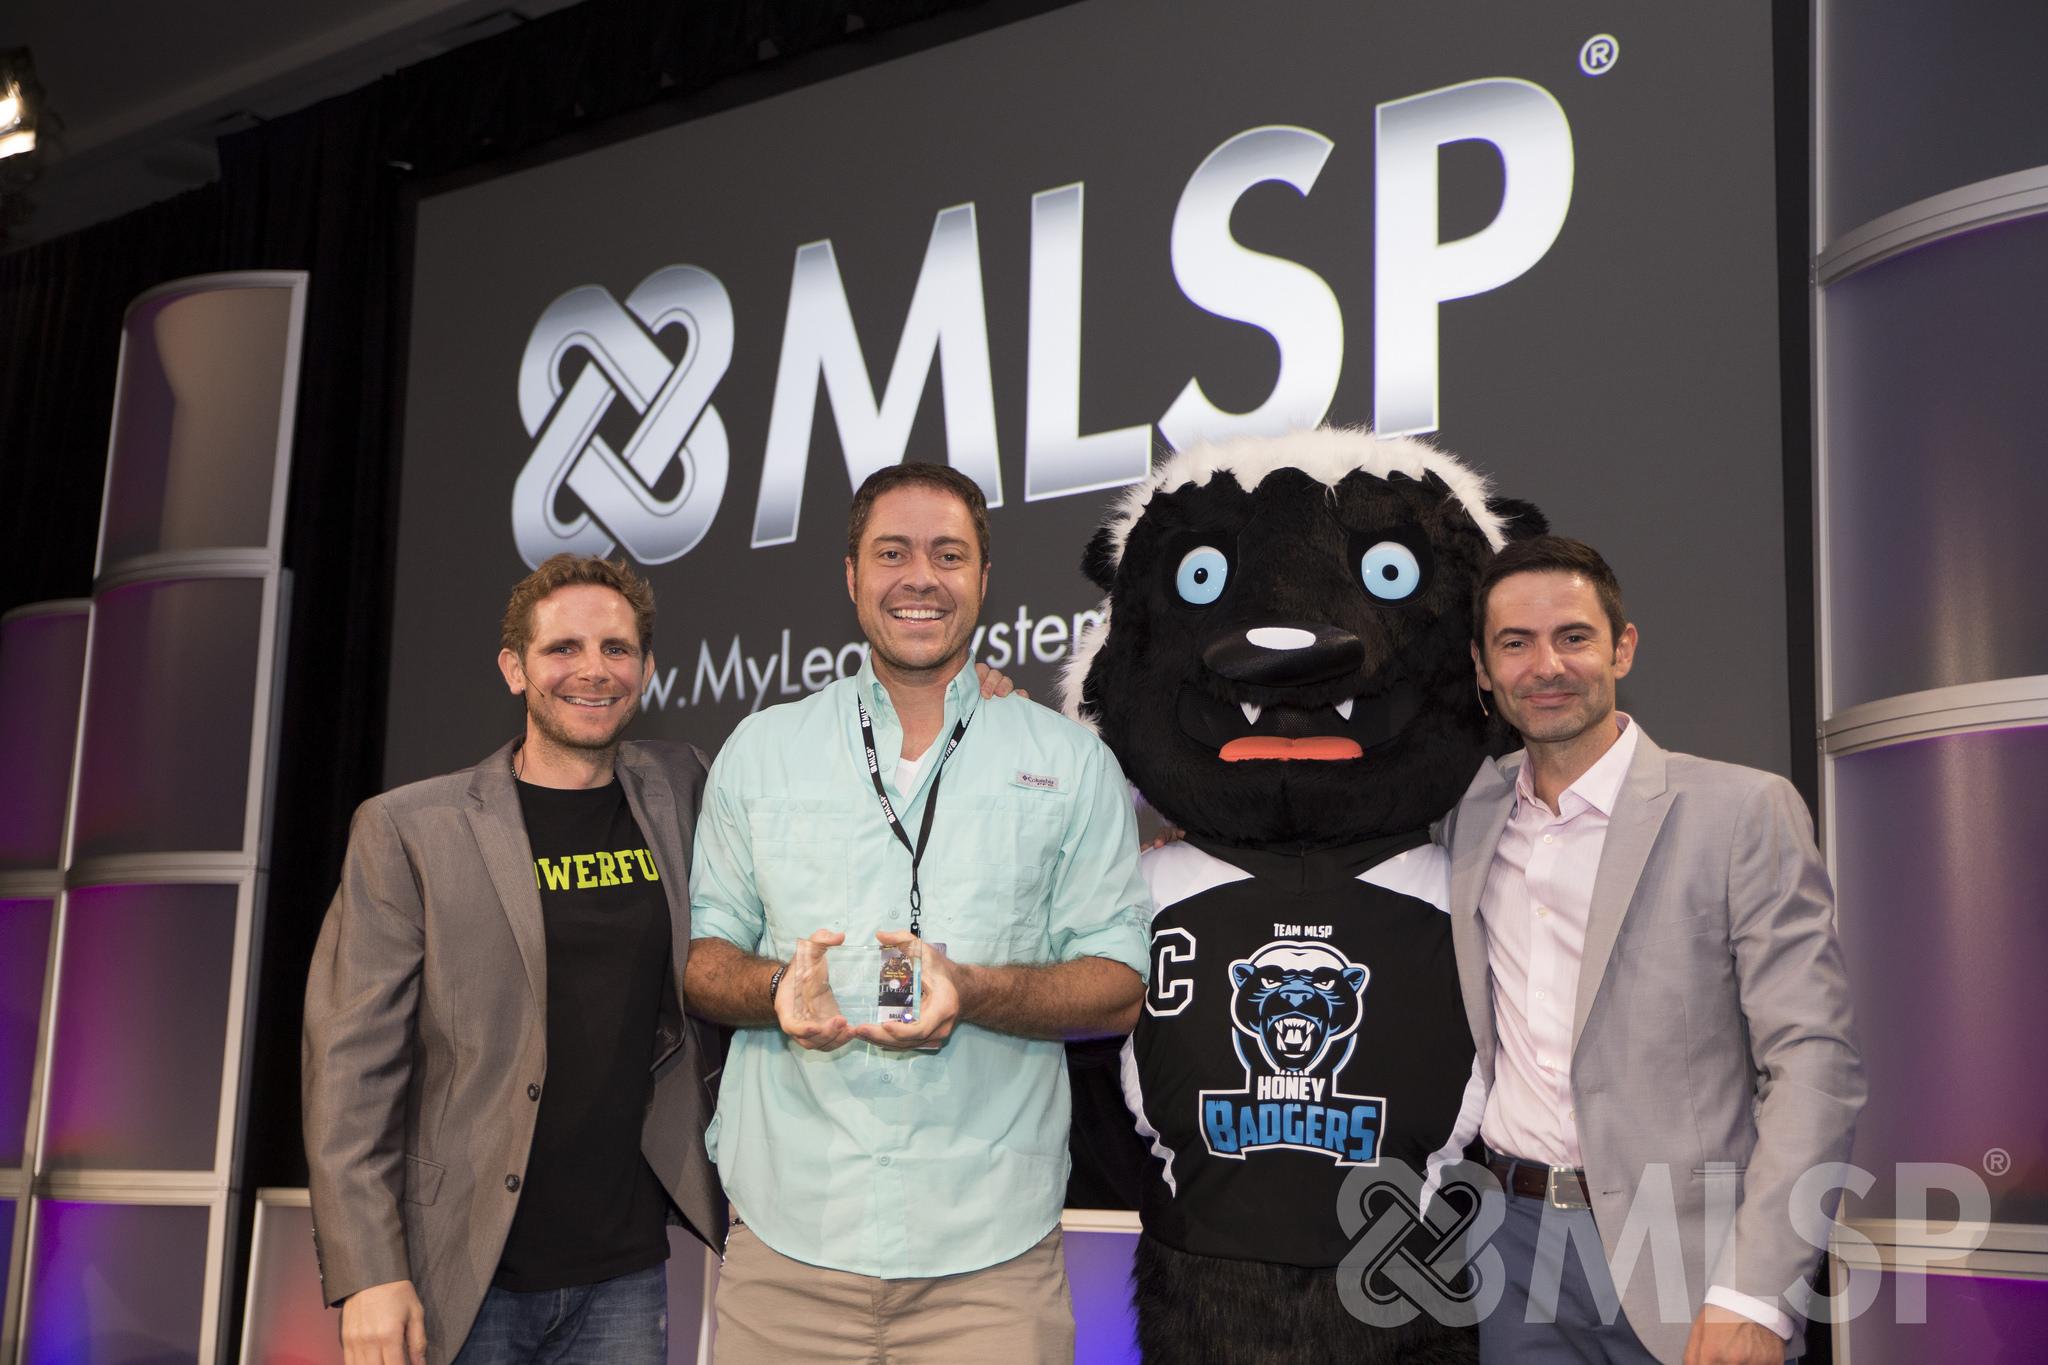 Brian Garcia Live - MLSP Leader